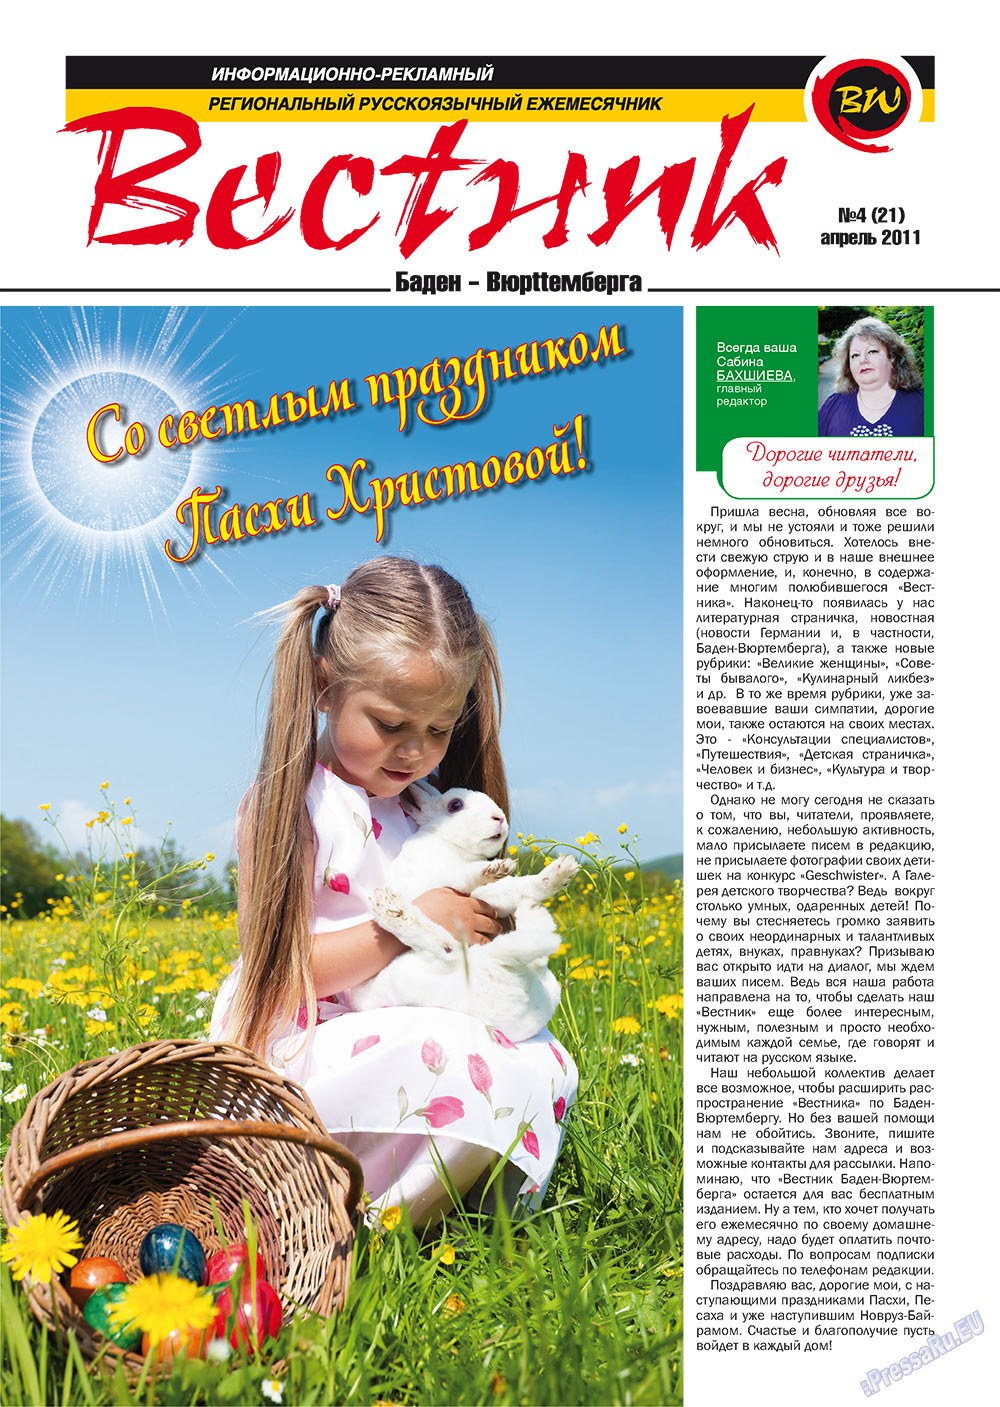 Вестник-info (журнал). 2011 год, номер 4, стр. 1